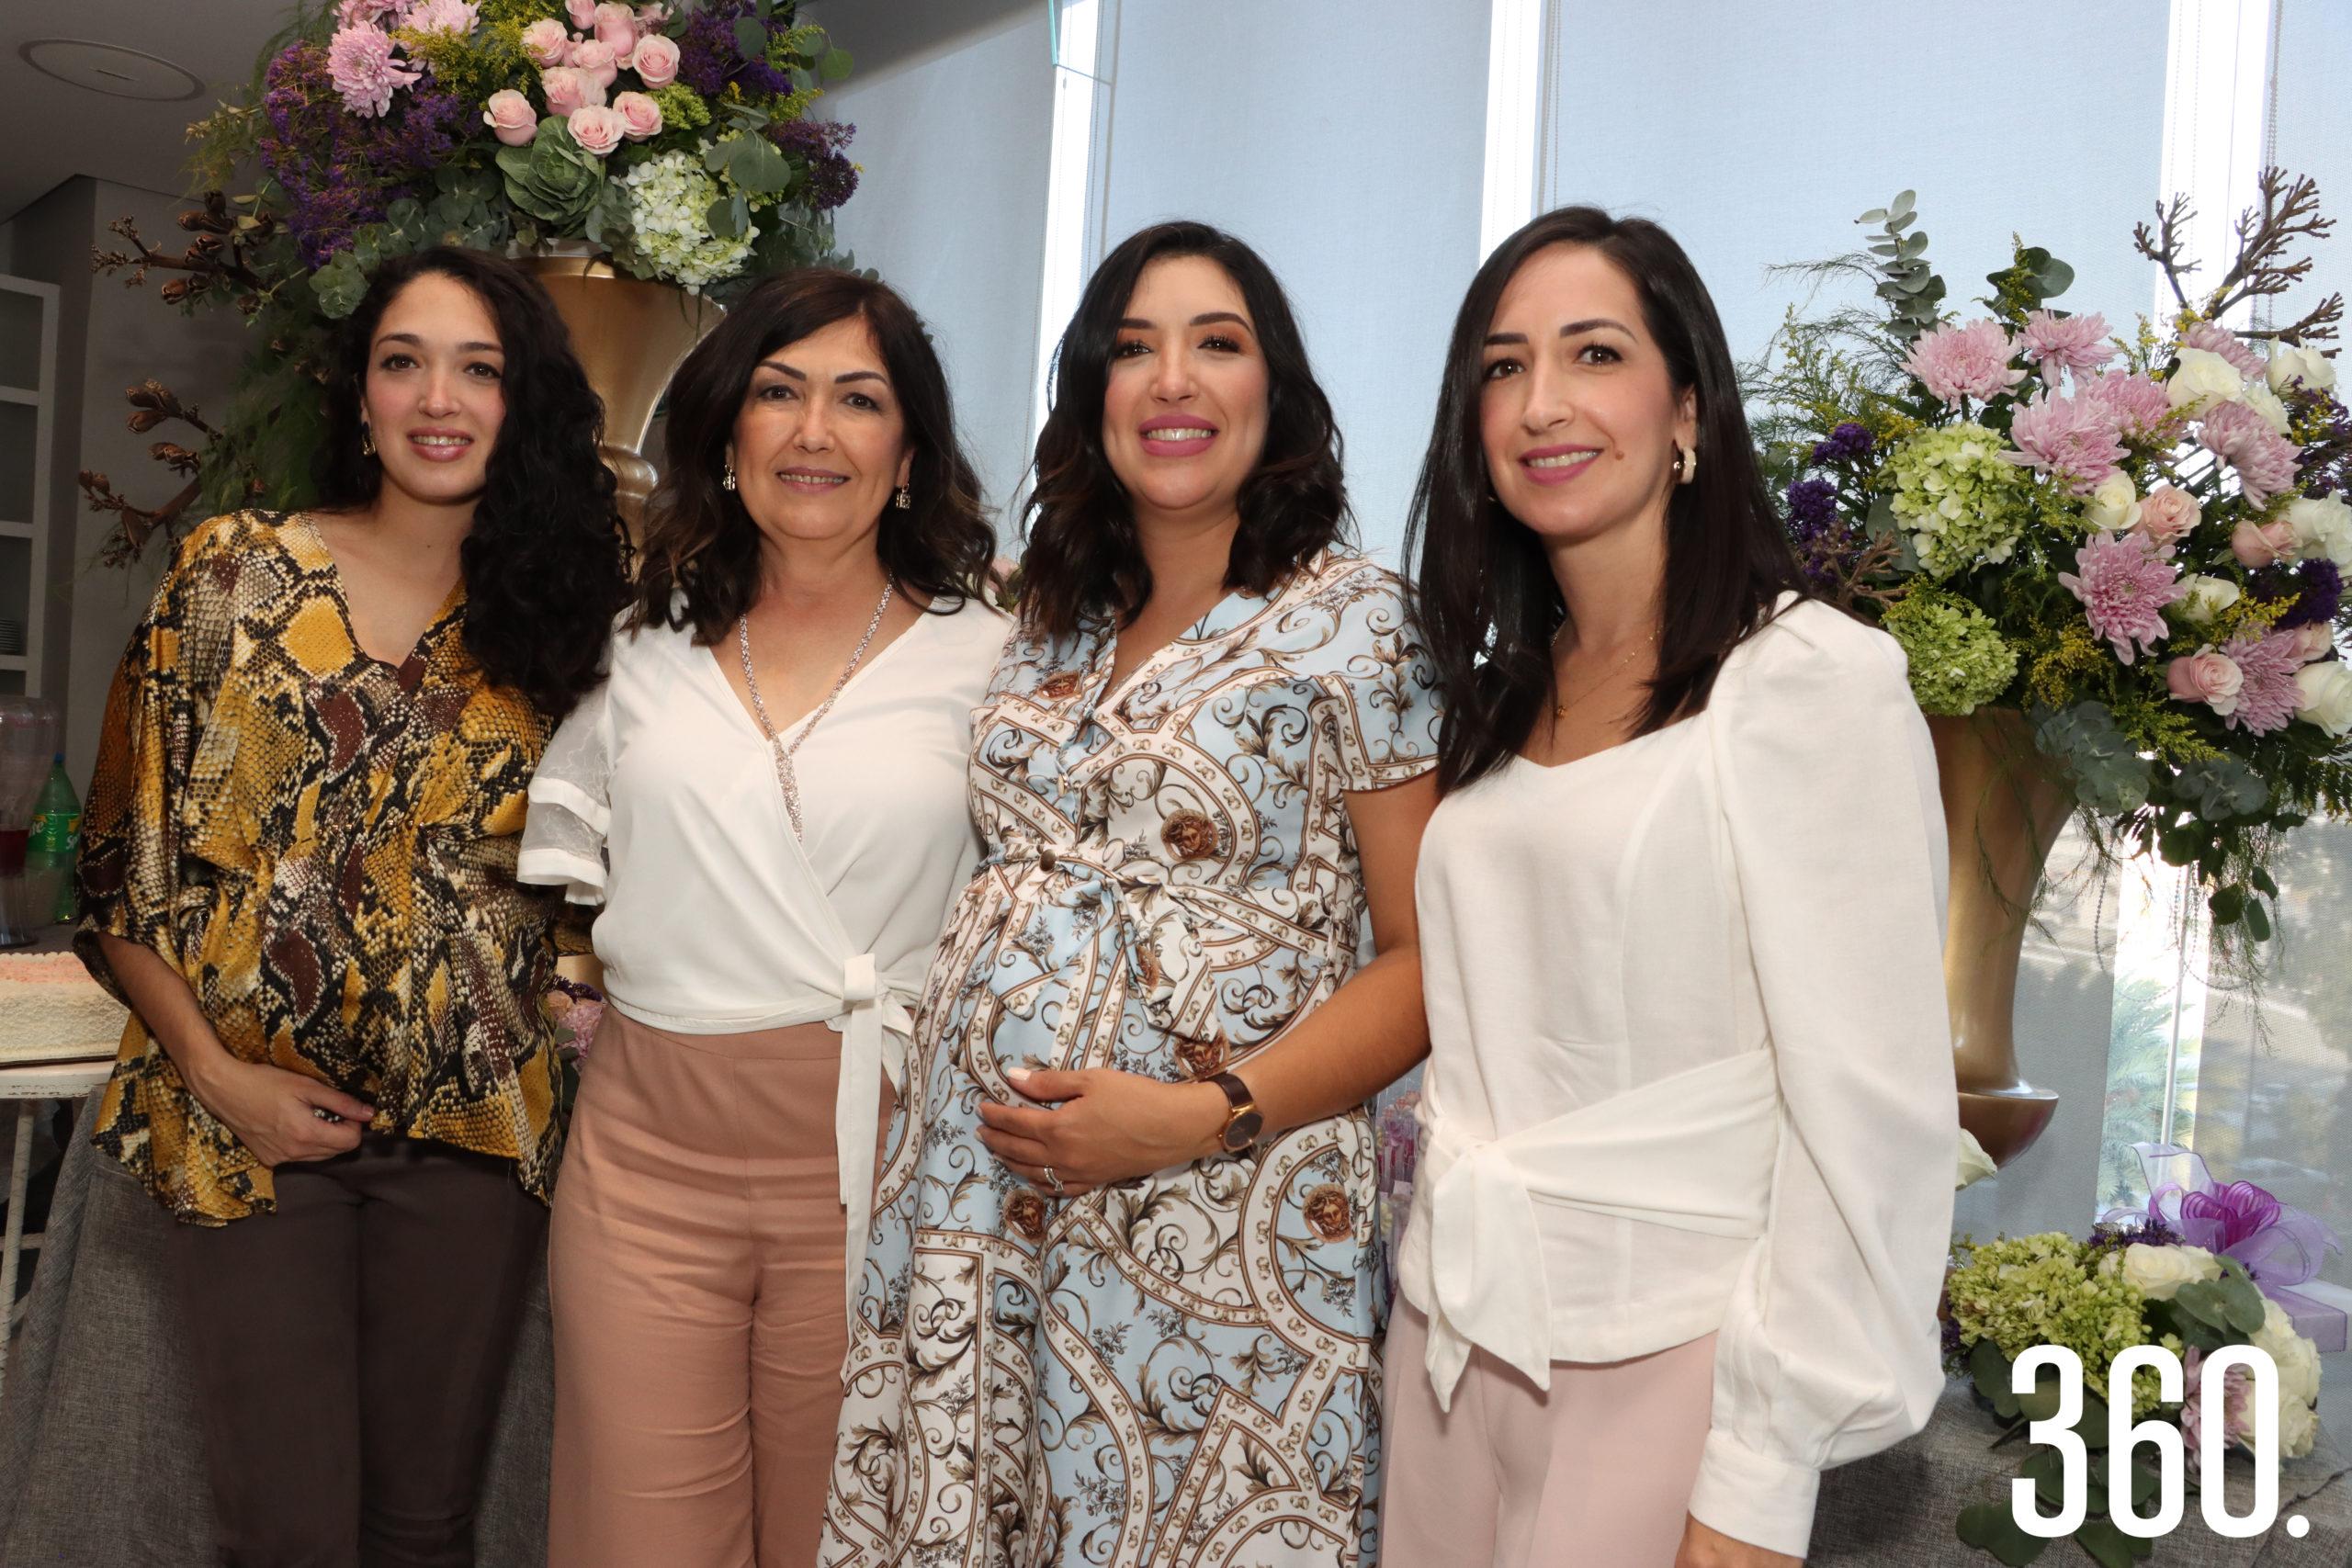 Celina Treviño de Martínez, Geraldina Moncayo, Mariana Treviño, Geraldina Treviño de Villarreal.